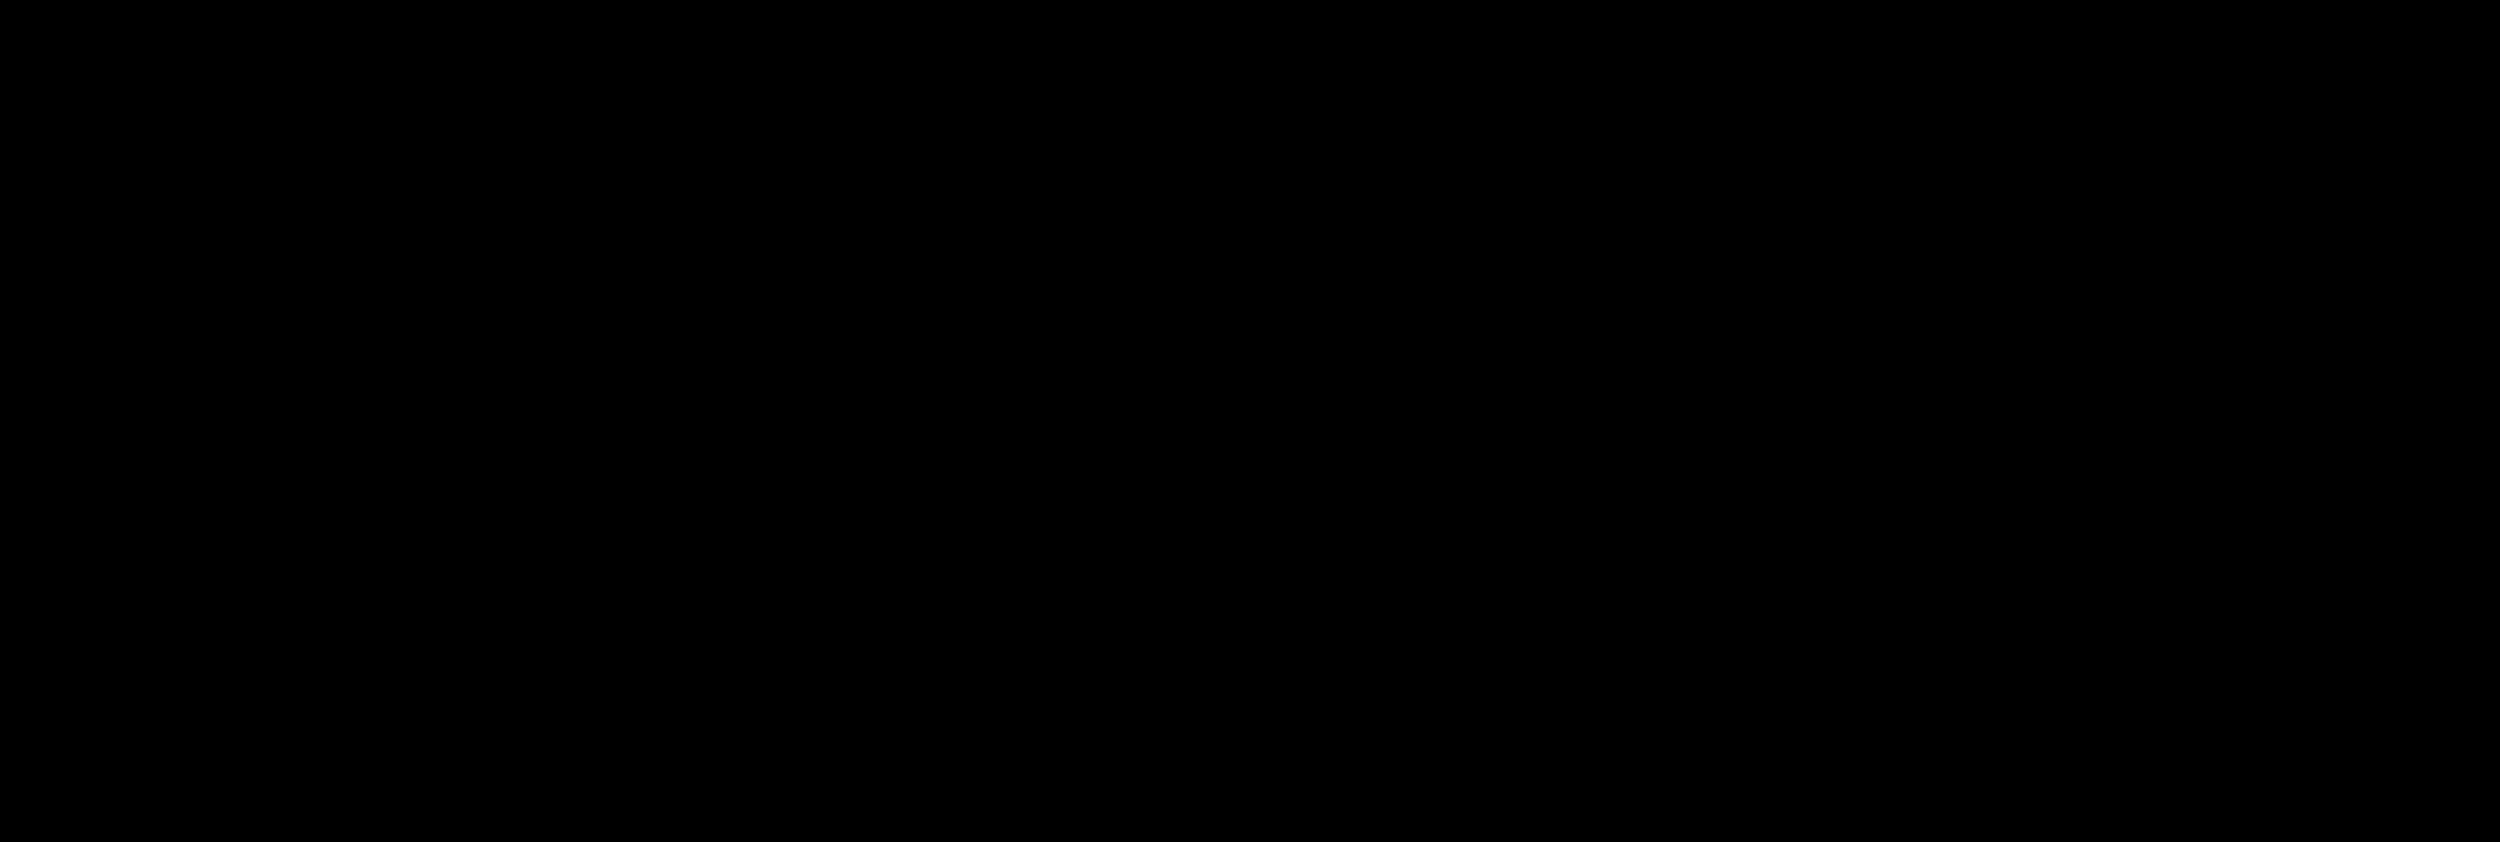 Samsung_logo copy.png